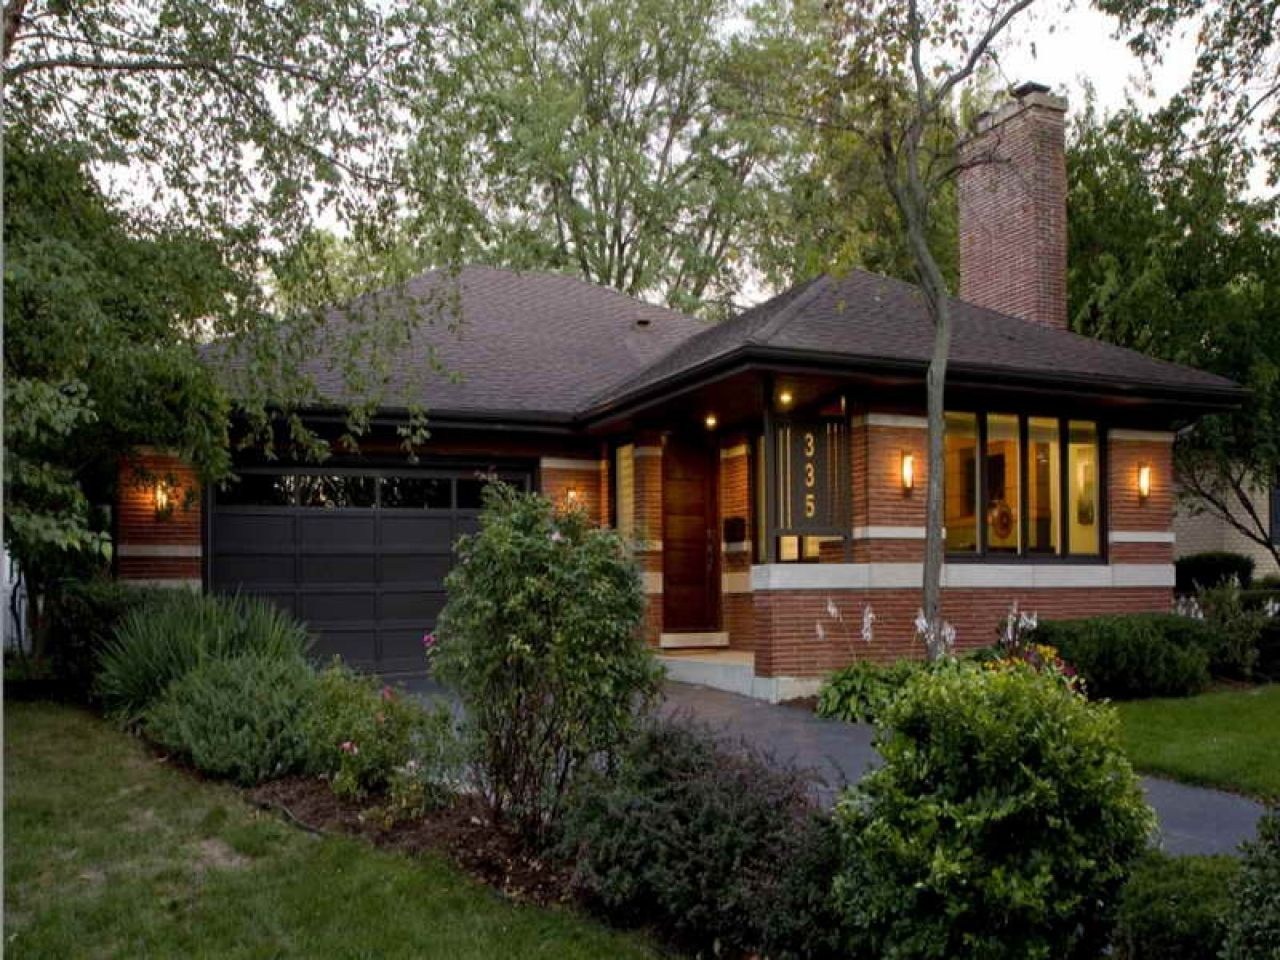 Style home modern house exterior colors interior designs flauminc com - Www Flauminc Com Size 1280x960 Server15 Cdn 2015 12 02 Brick Ranch